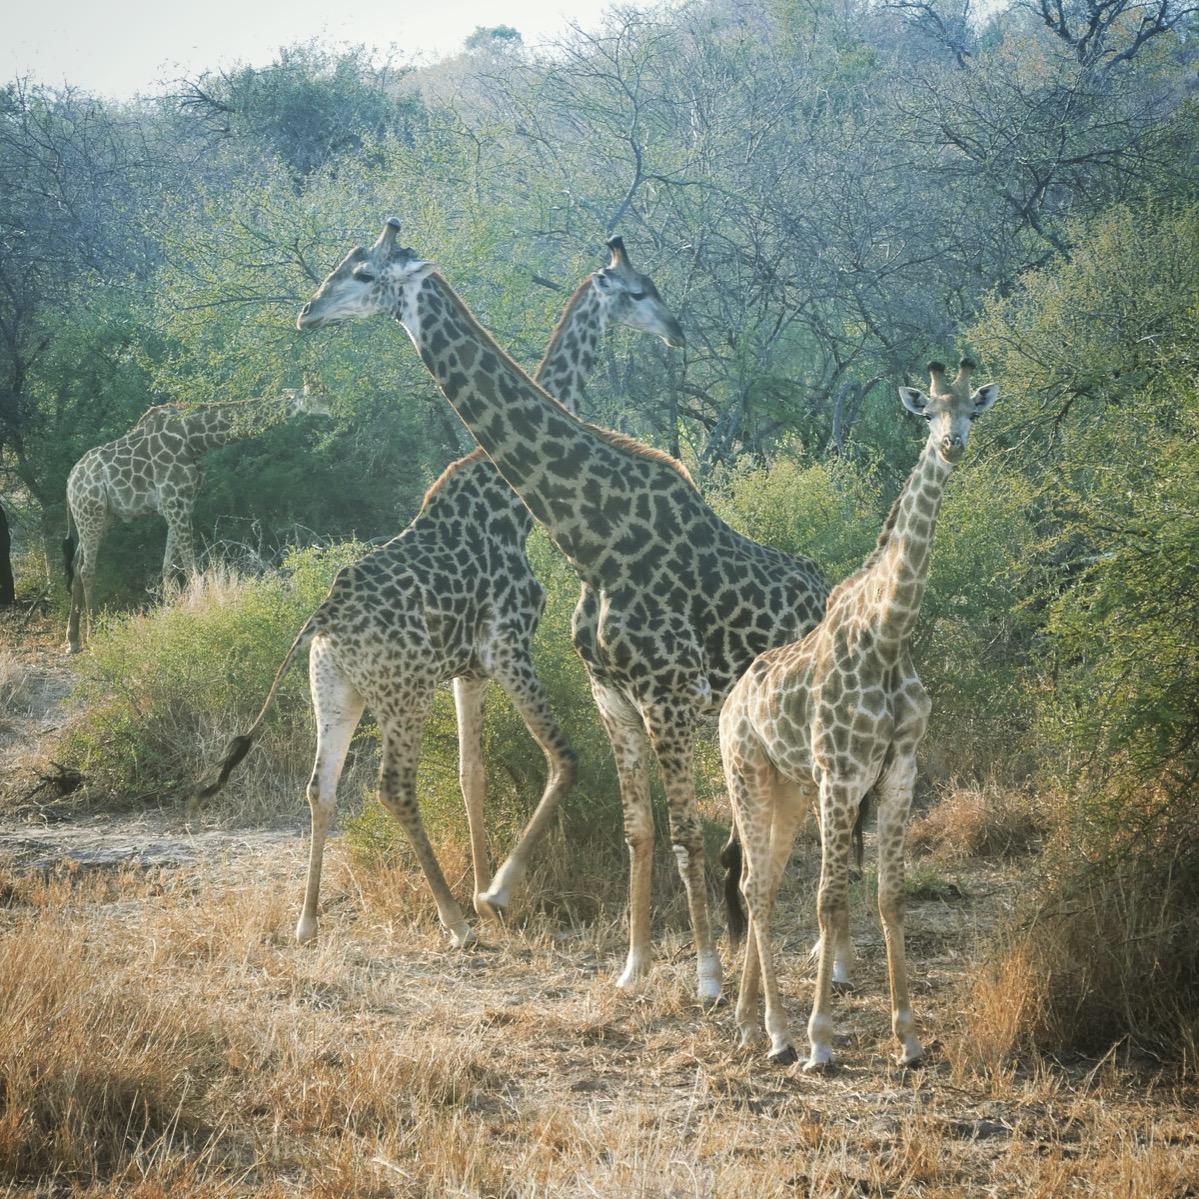 Several giraffes graze at Kruger National Park. Noah Strycker